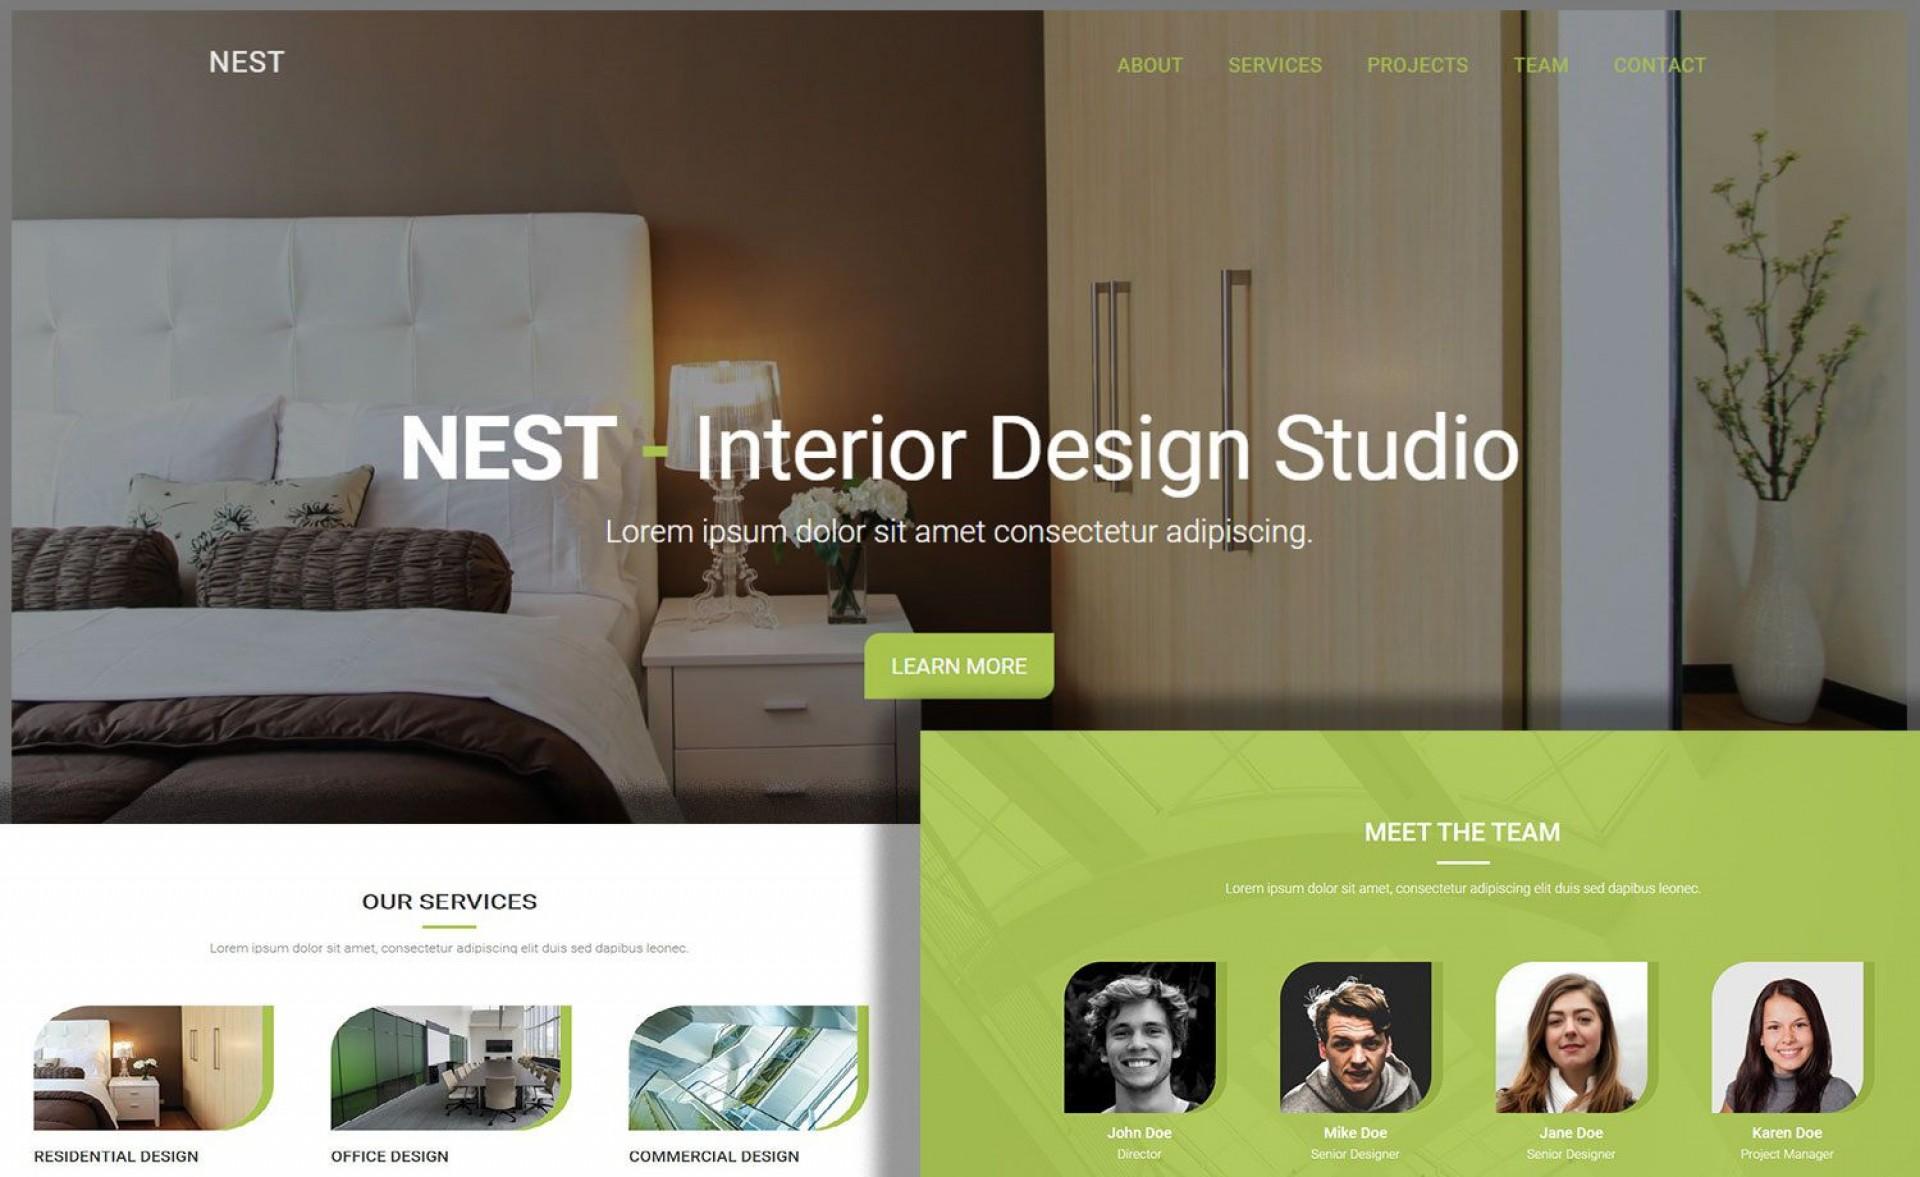 006 Surprising Interior Design Html Template Free Download Image 1920